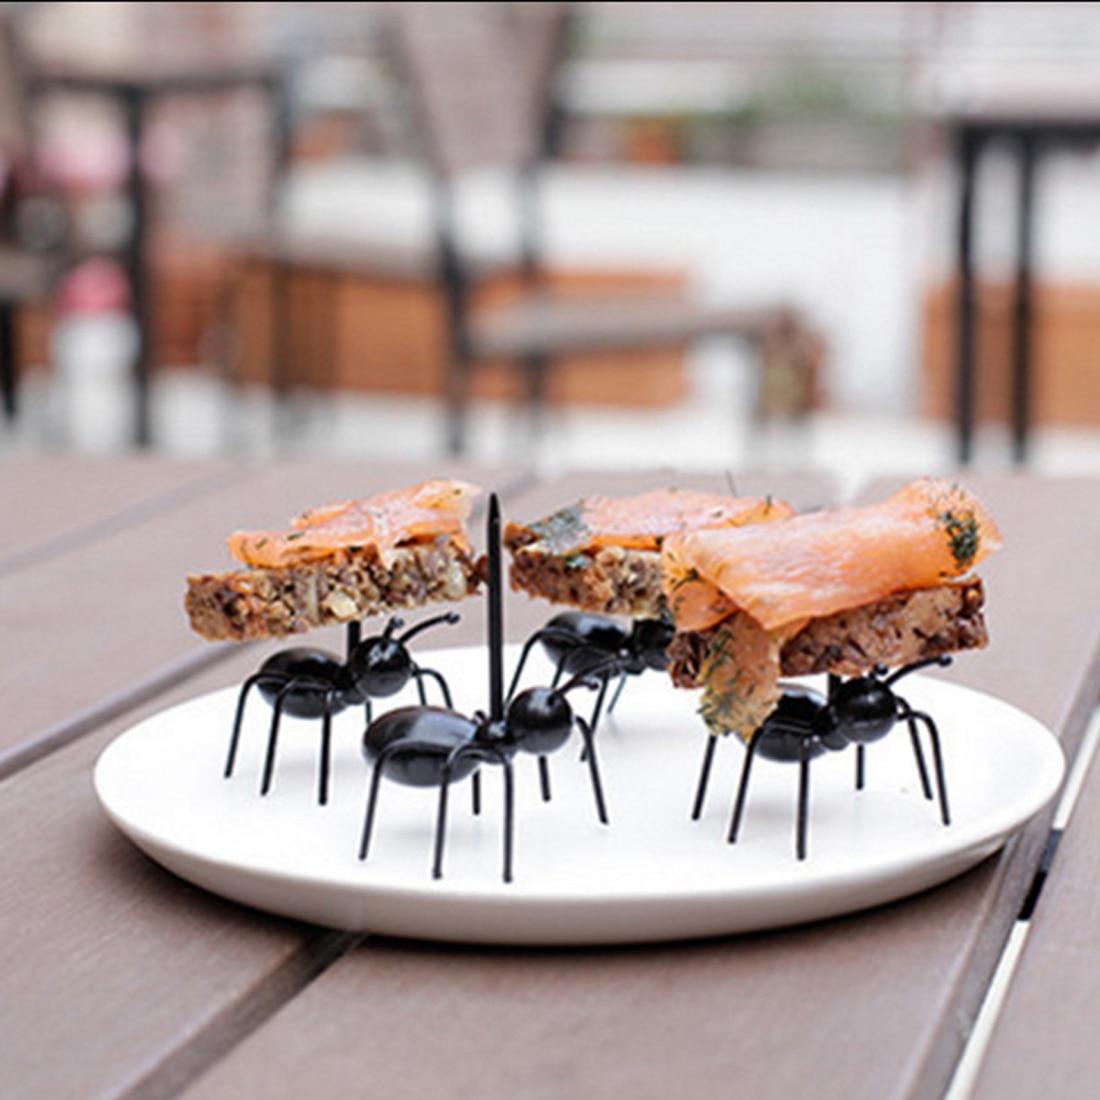 12PCs/ Set Cute Mini Ant Fruit Forks Plastic Snack Cake Dessert Forks Talheres Fruit Pick Tableware Fork Ant toothpick